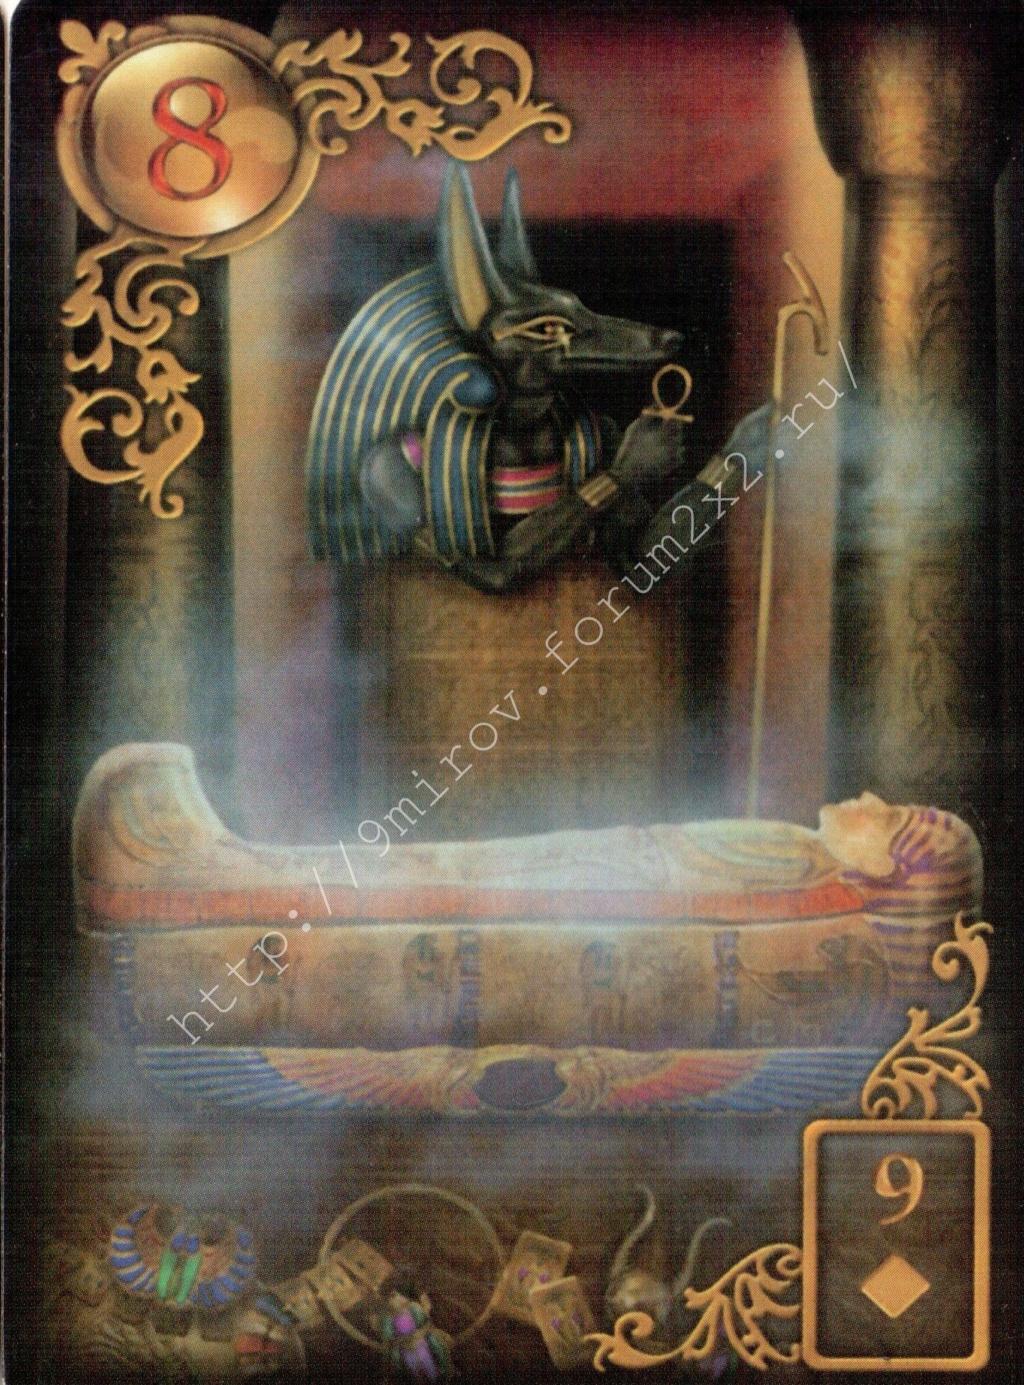 Золотые мечты Ленорман (Расширенное издание) | Gilded Reverie Lenormand. Галерея.  Water104